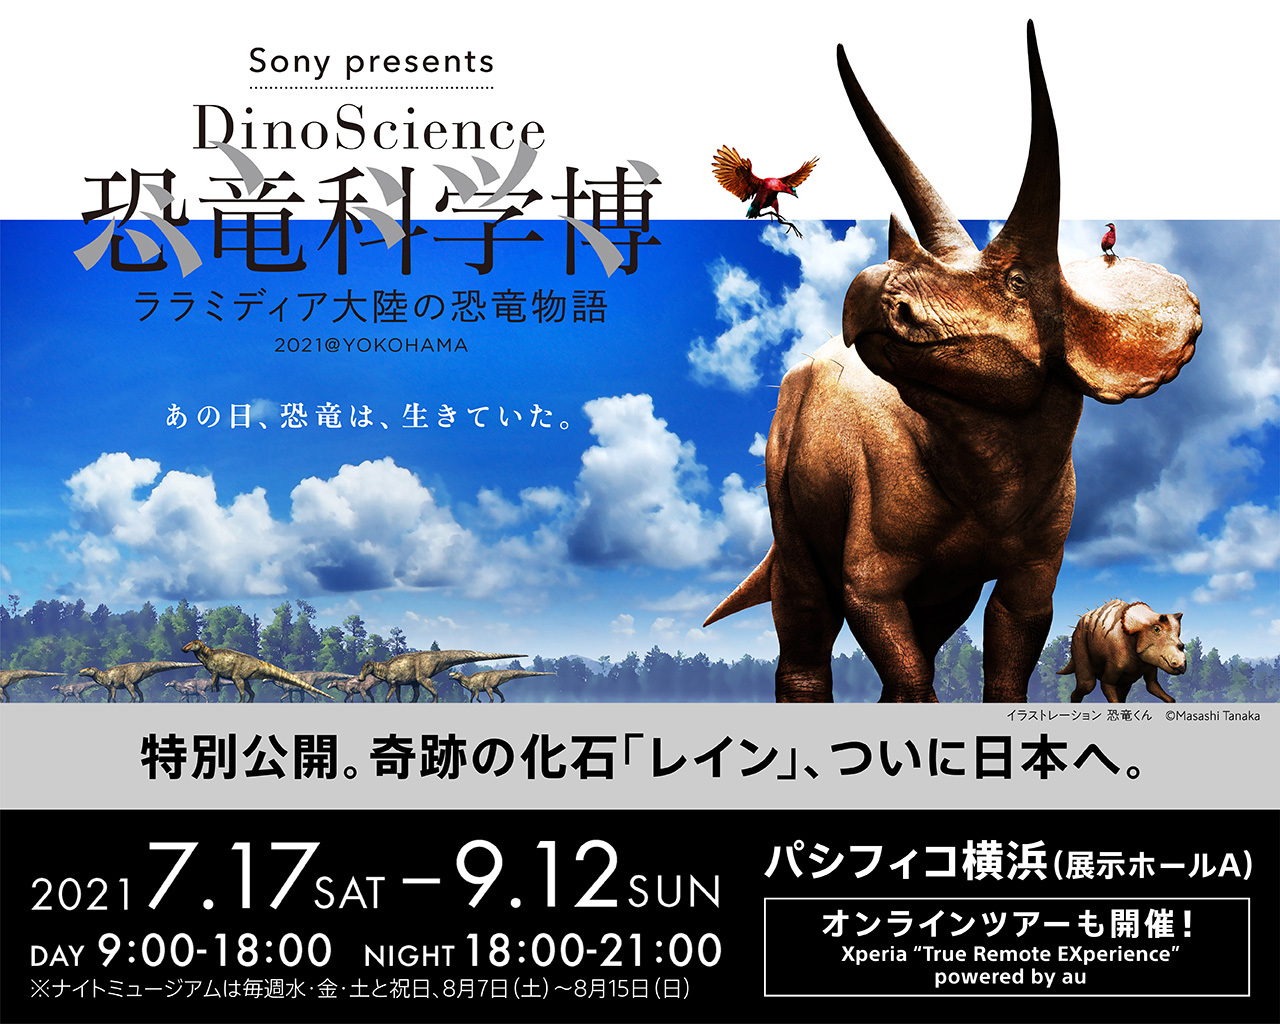 『Sony presents DinoScience 恐竜科学博 〜ララミディア大陸の恐竜物語〜』